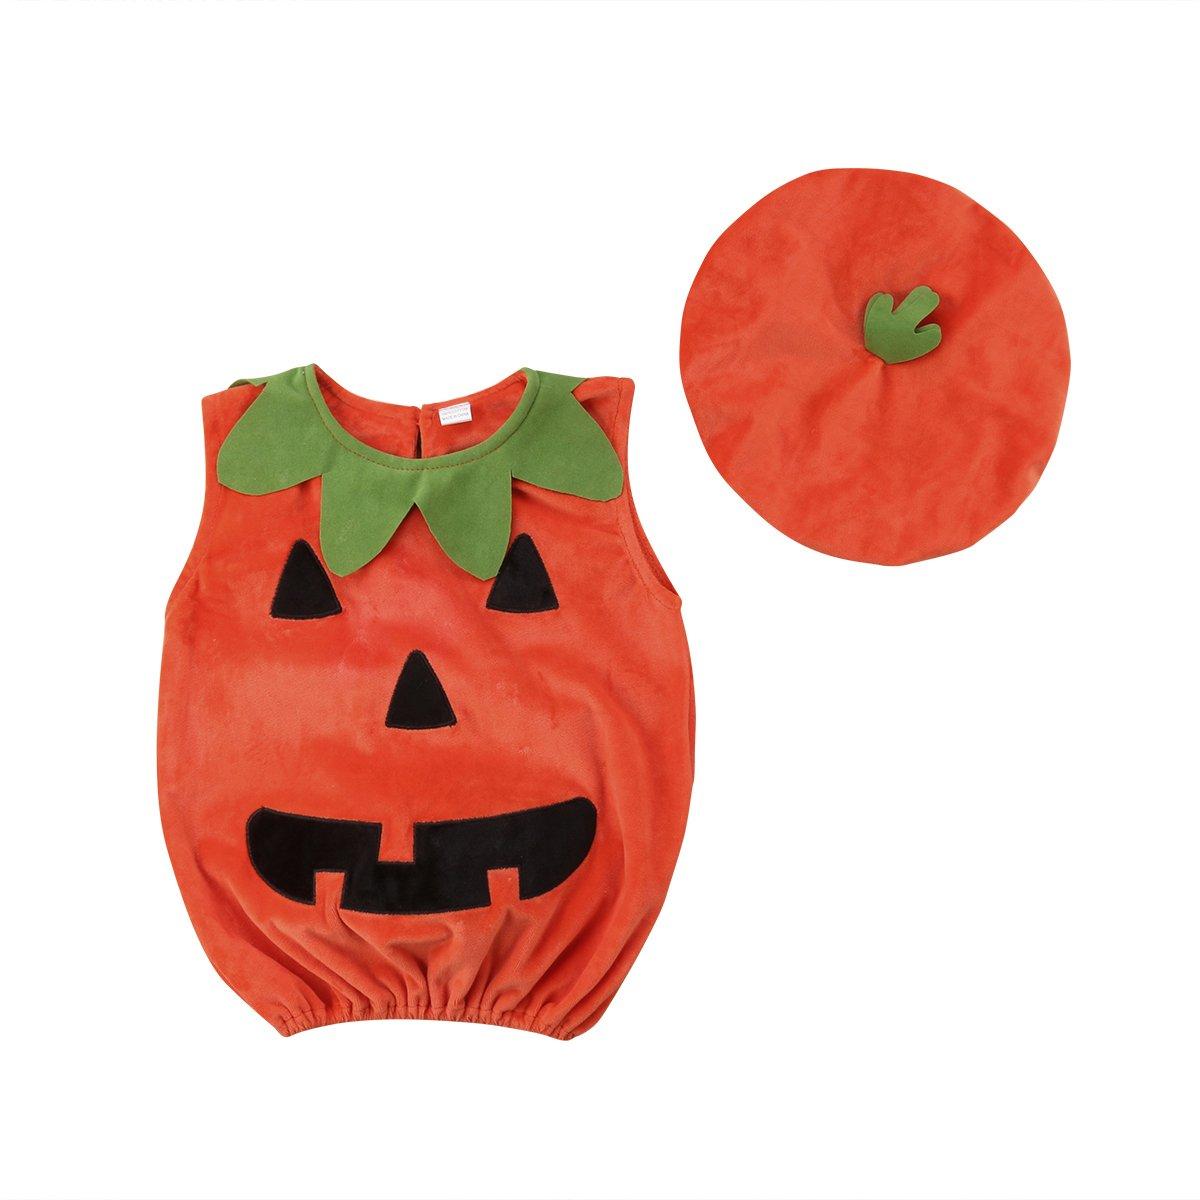 WangsCanis Cosplay Halloween Kürbiskostüm Süßes Säugling Kürbis Kostüm Jumpsuits mit Mütze für Baby Kind (0-6 Monate)